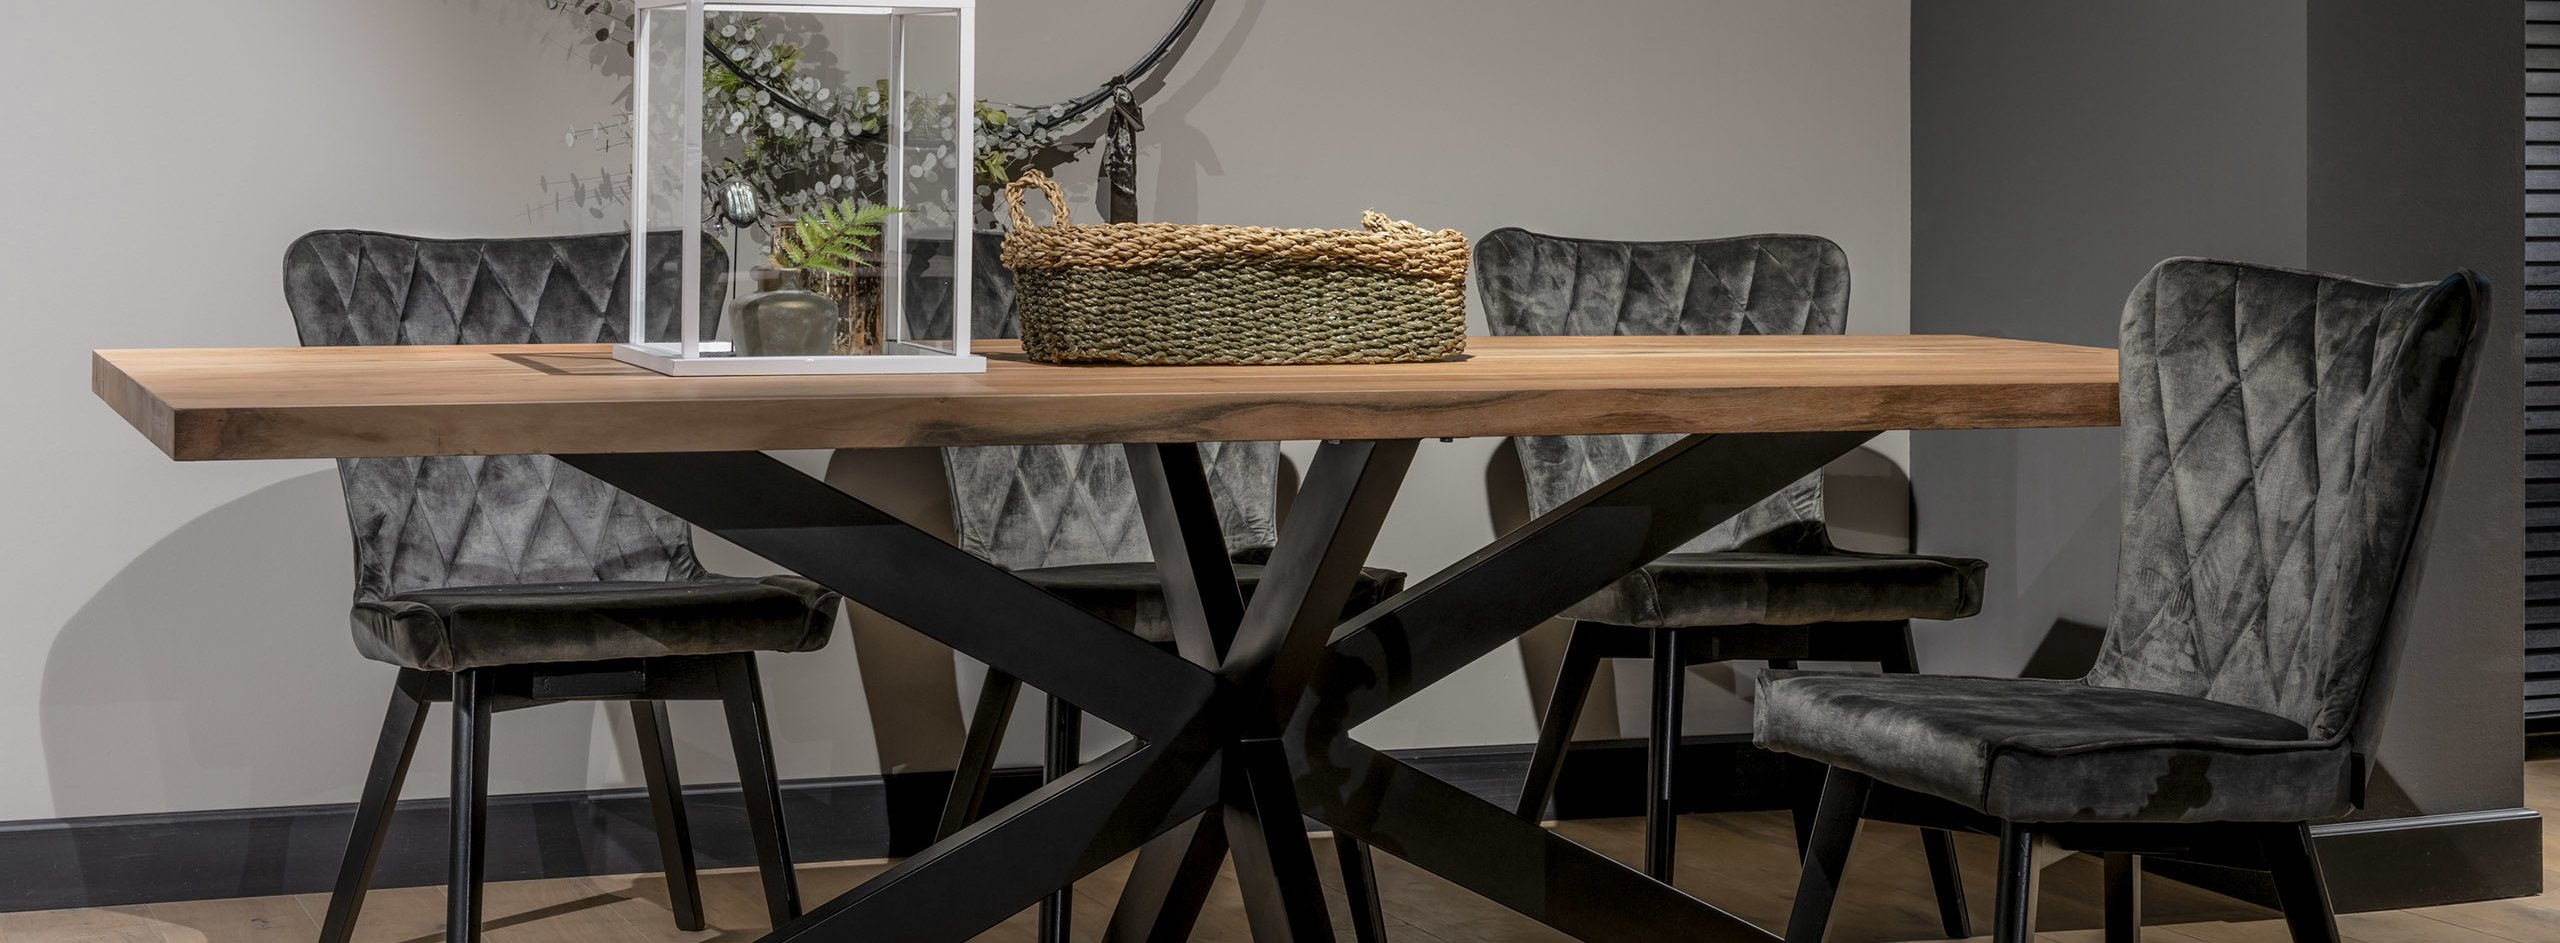 boomstam-tafel-luxe